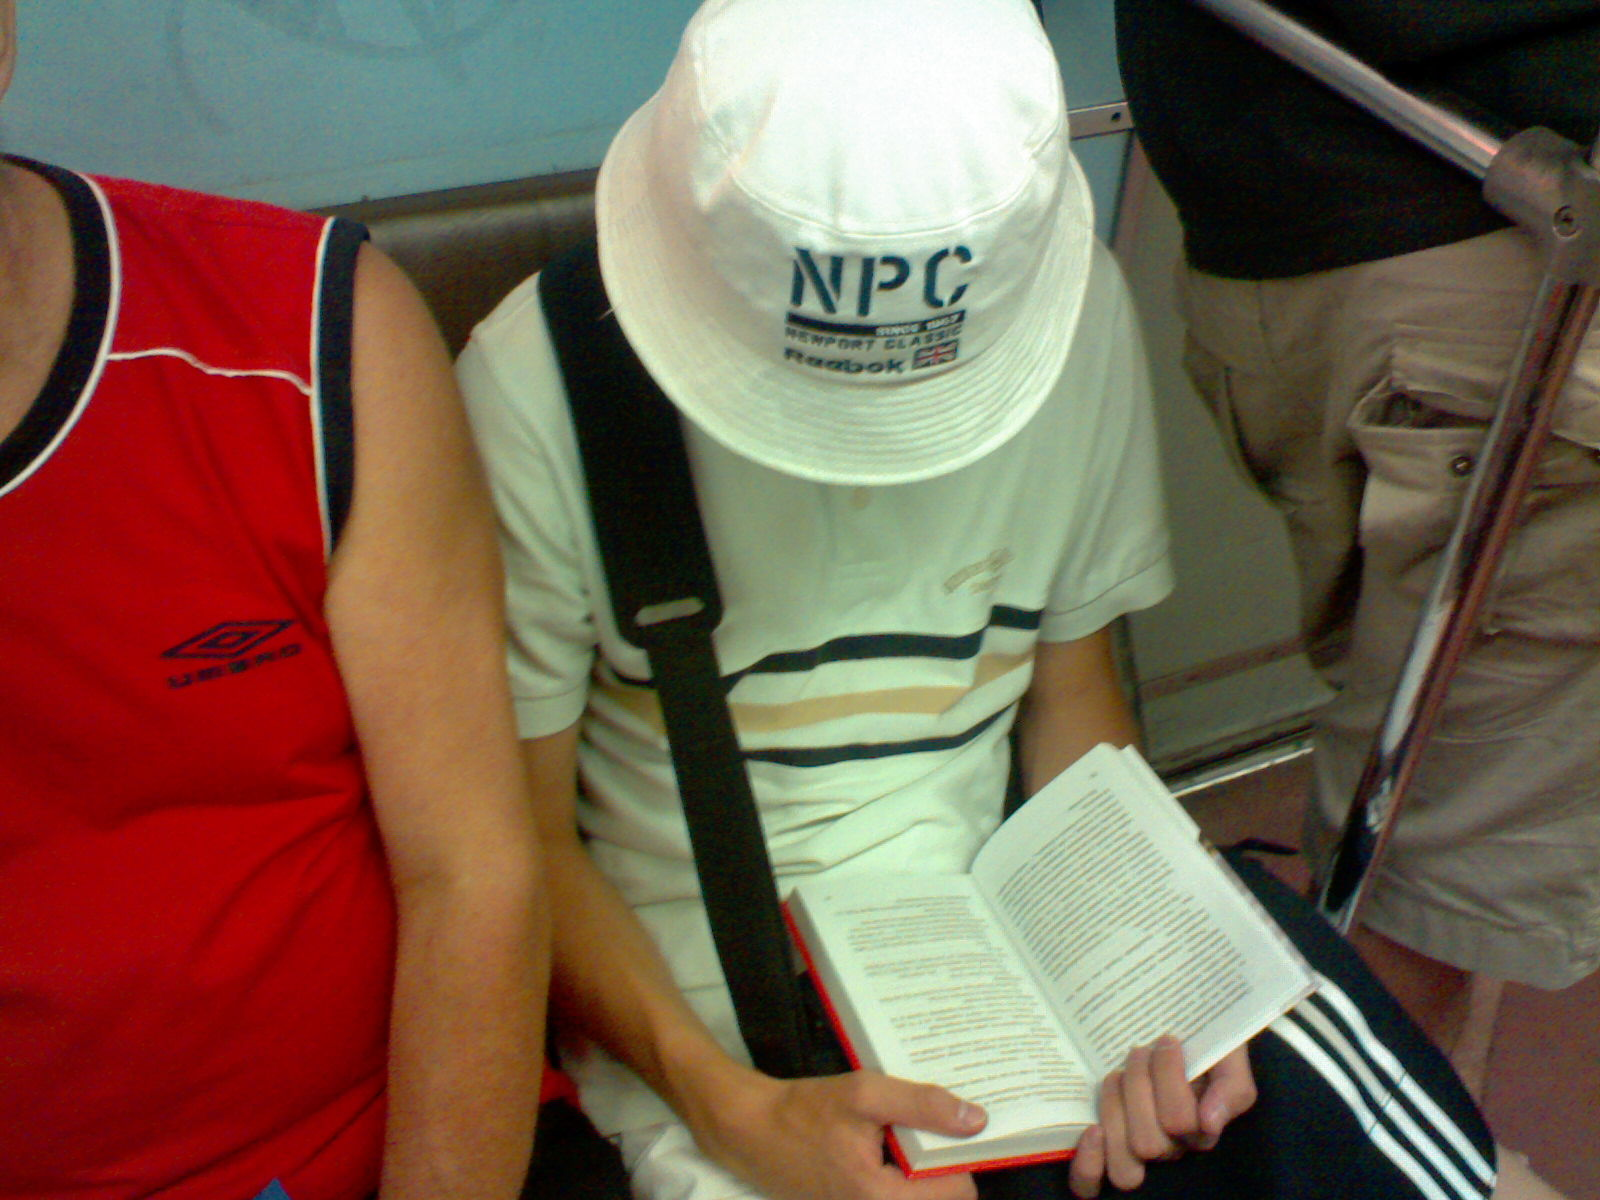 Вчера я встретил NPC